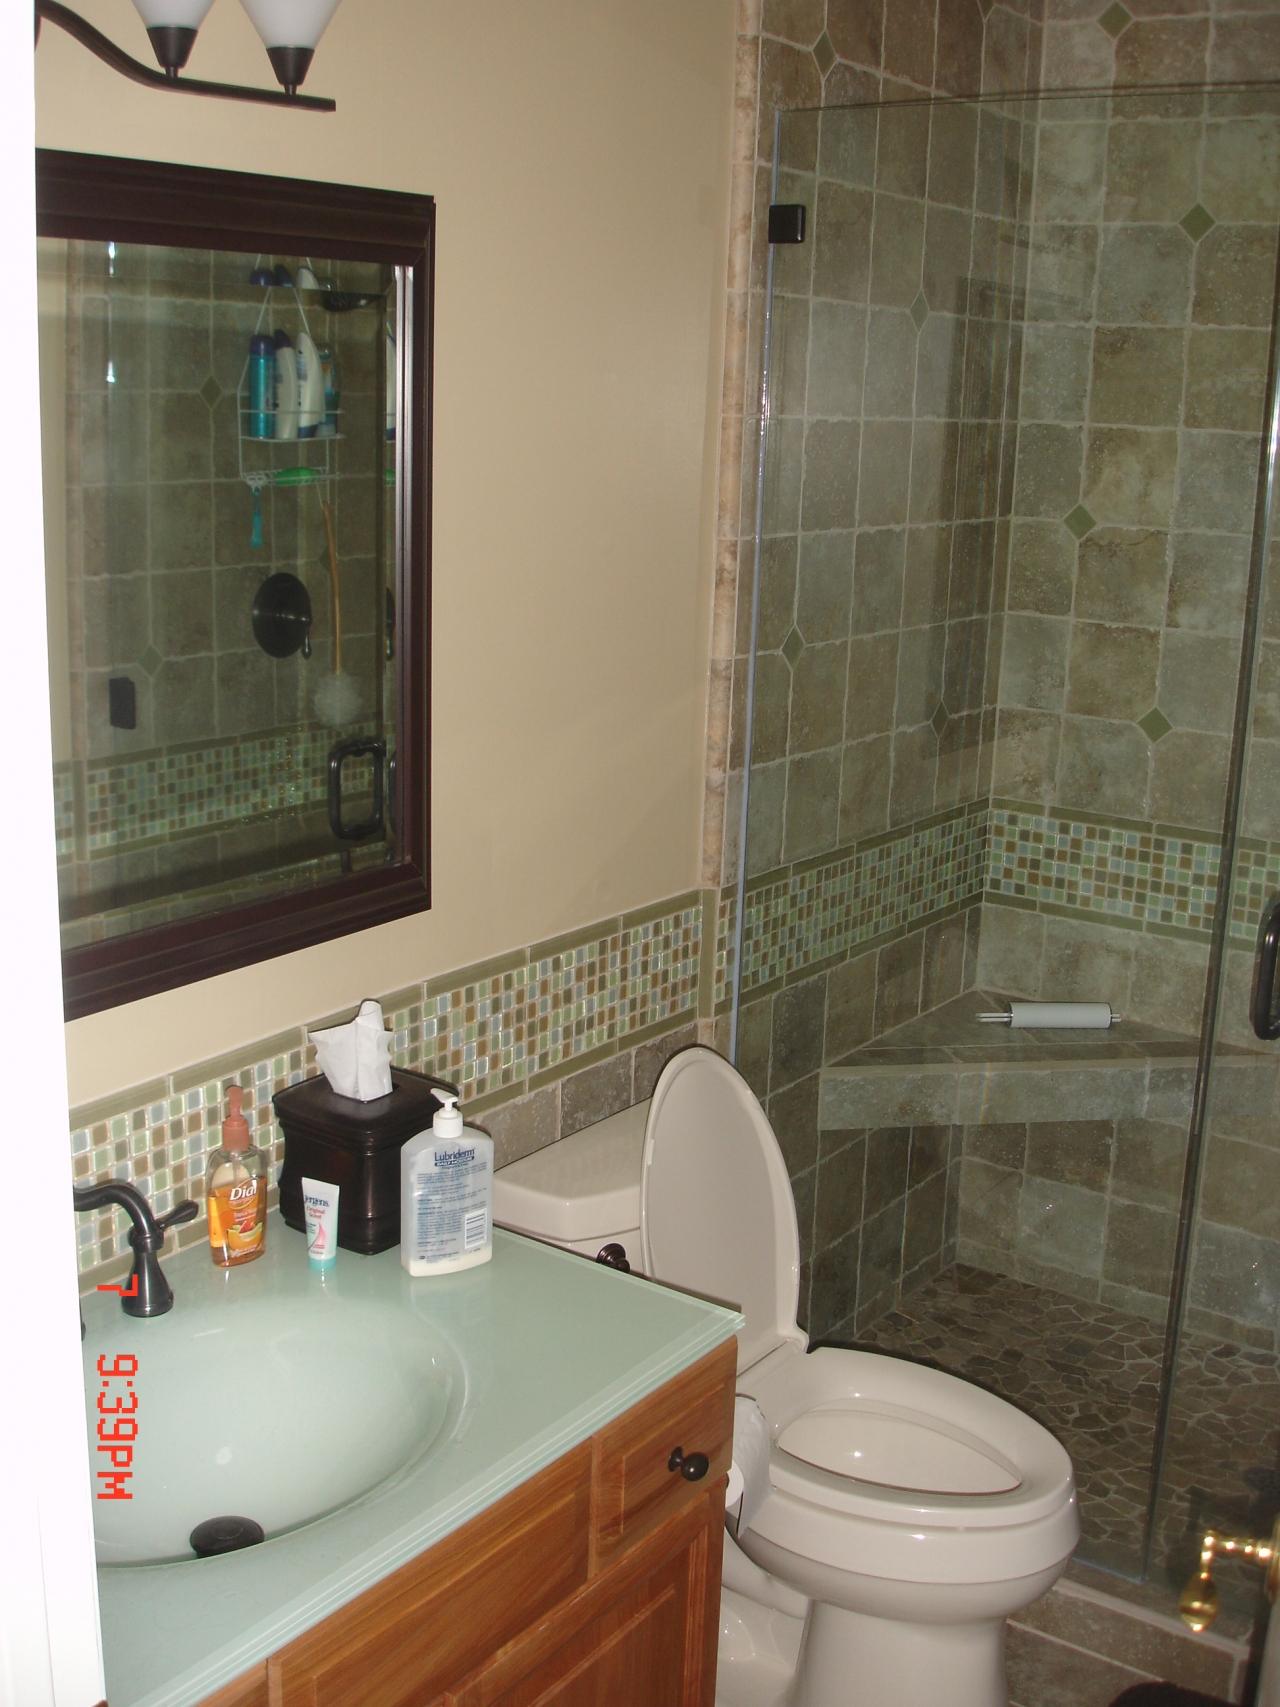 Bathroom Remodel In Benecia John Tanner General Contractor - Bathroom remodel walnut creek